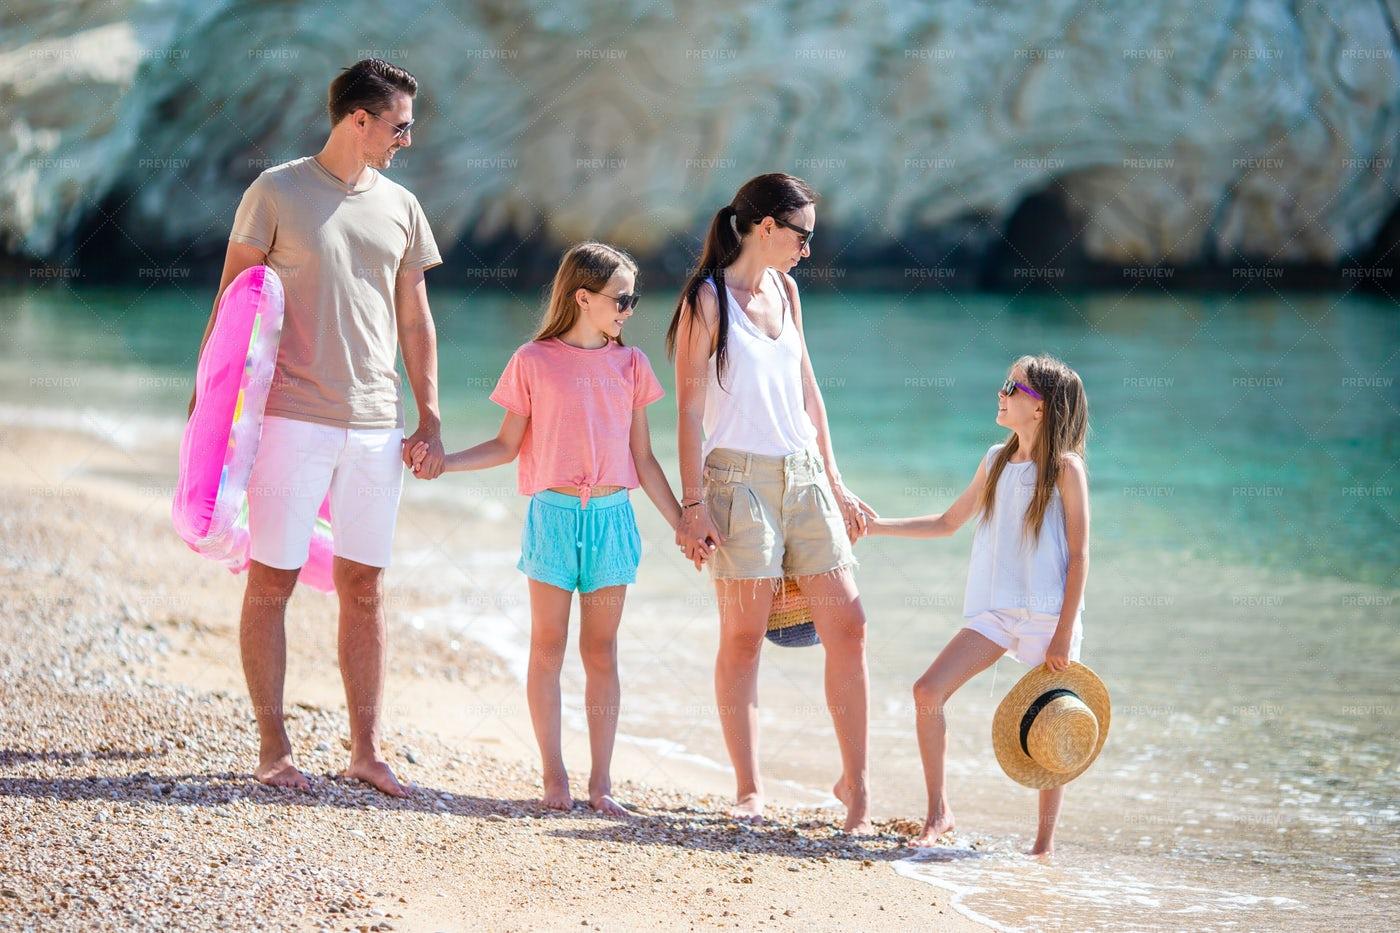 Family Walking On The Beach: Stock Photos